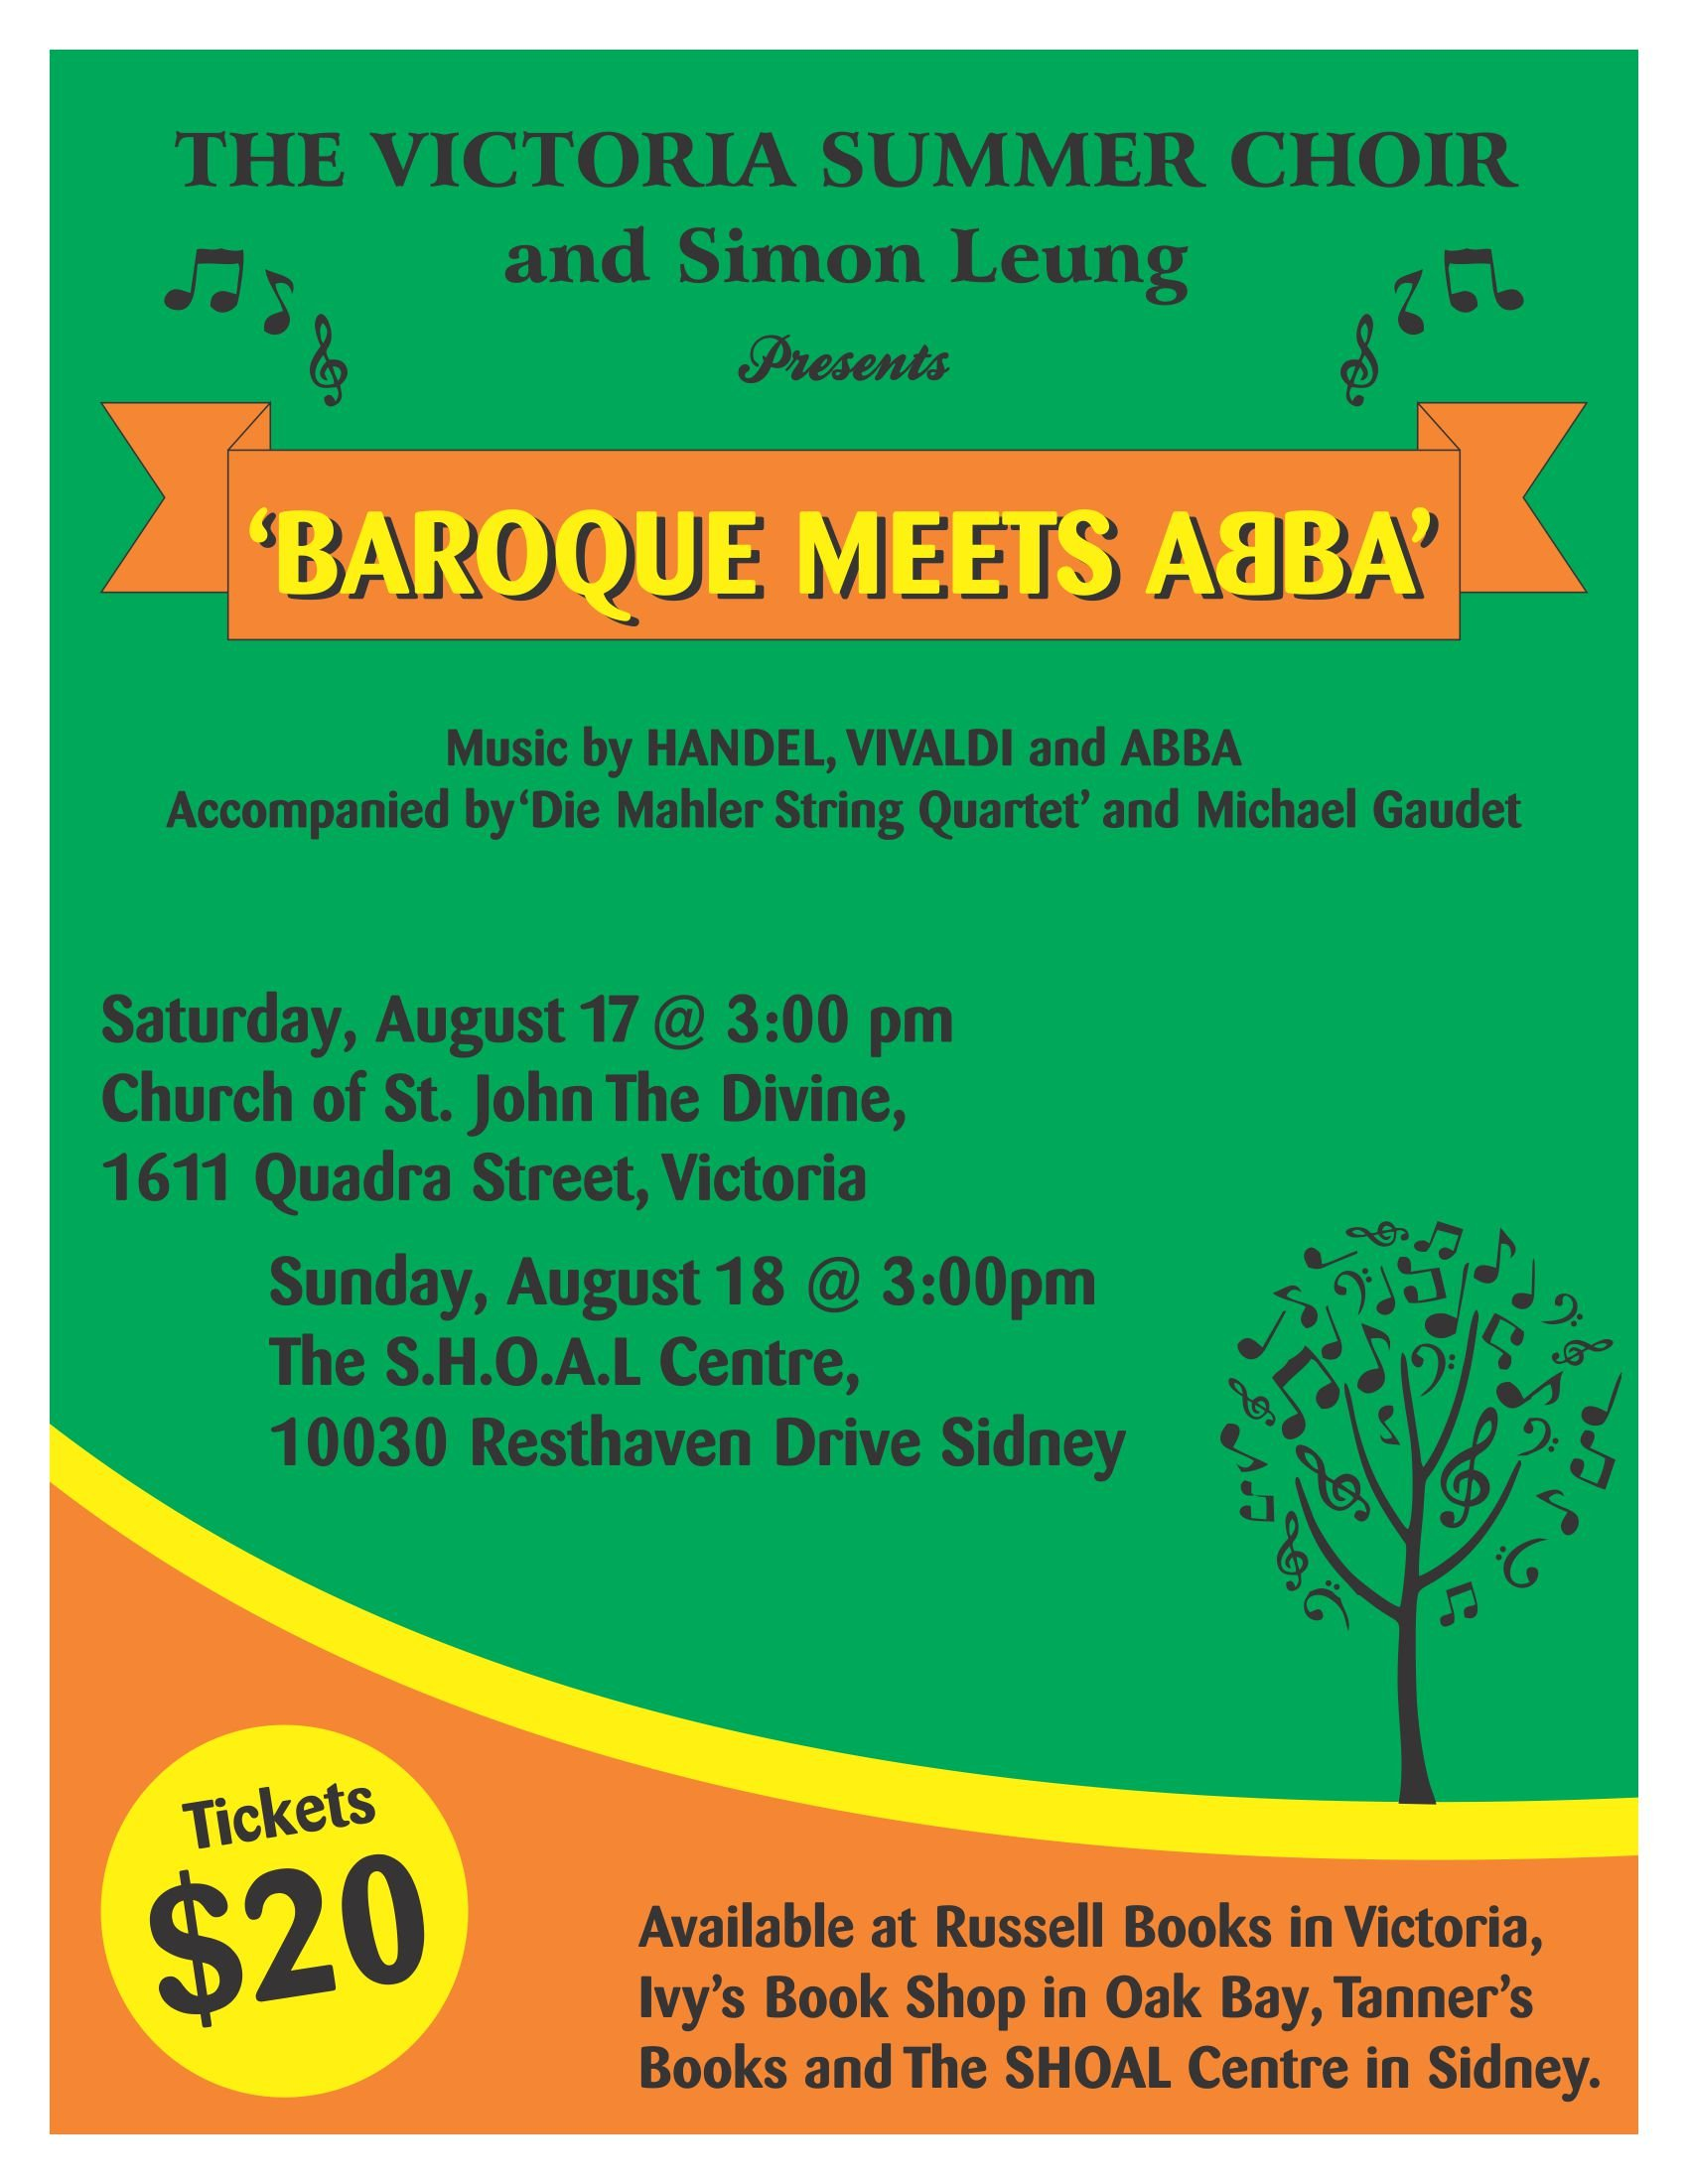 Baroque Meets Abba   Tourism Victoria